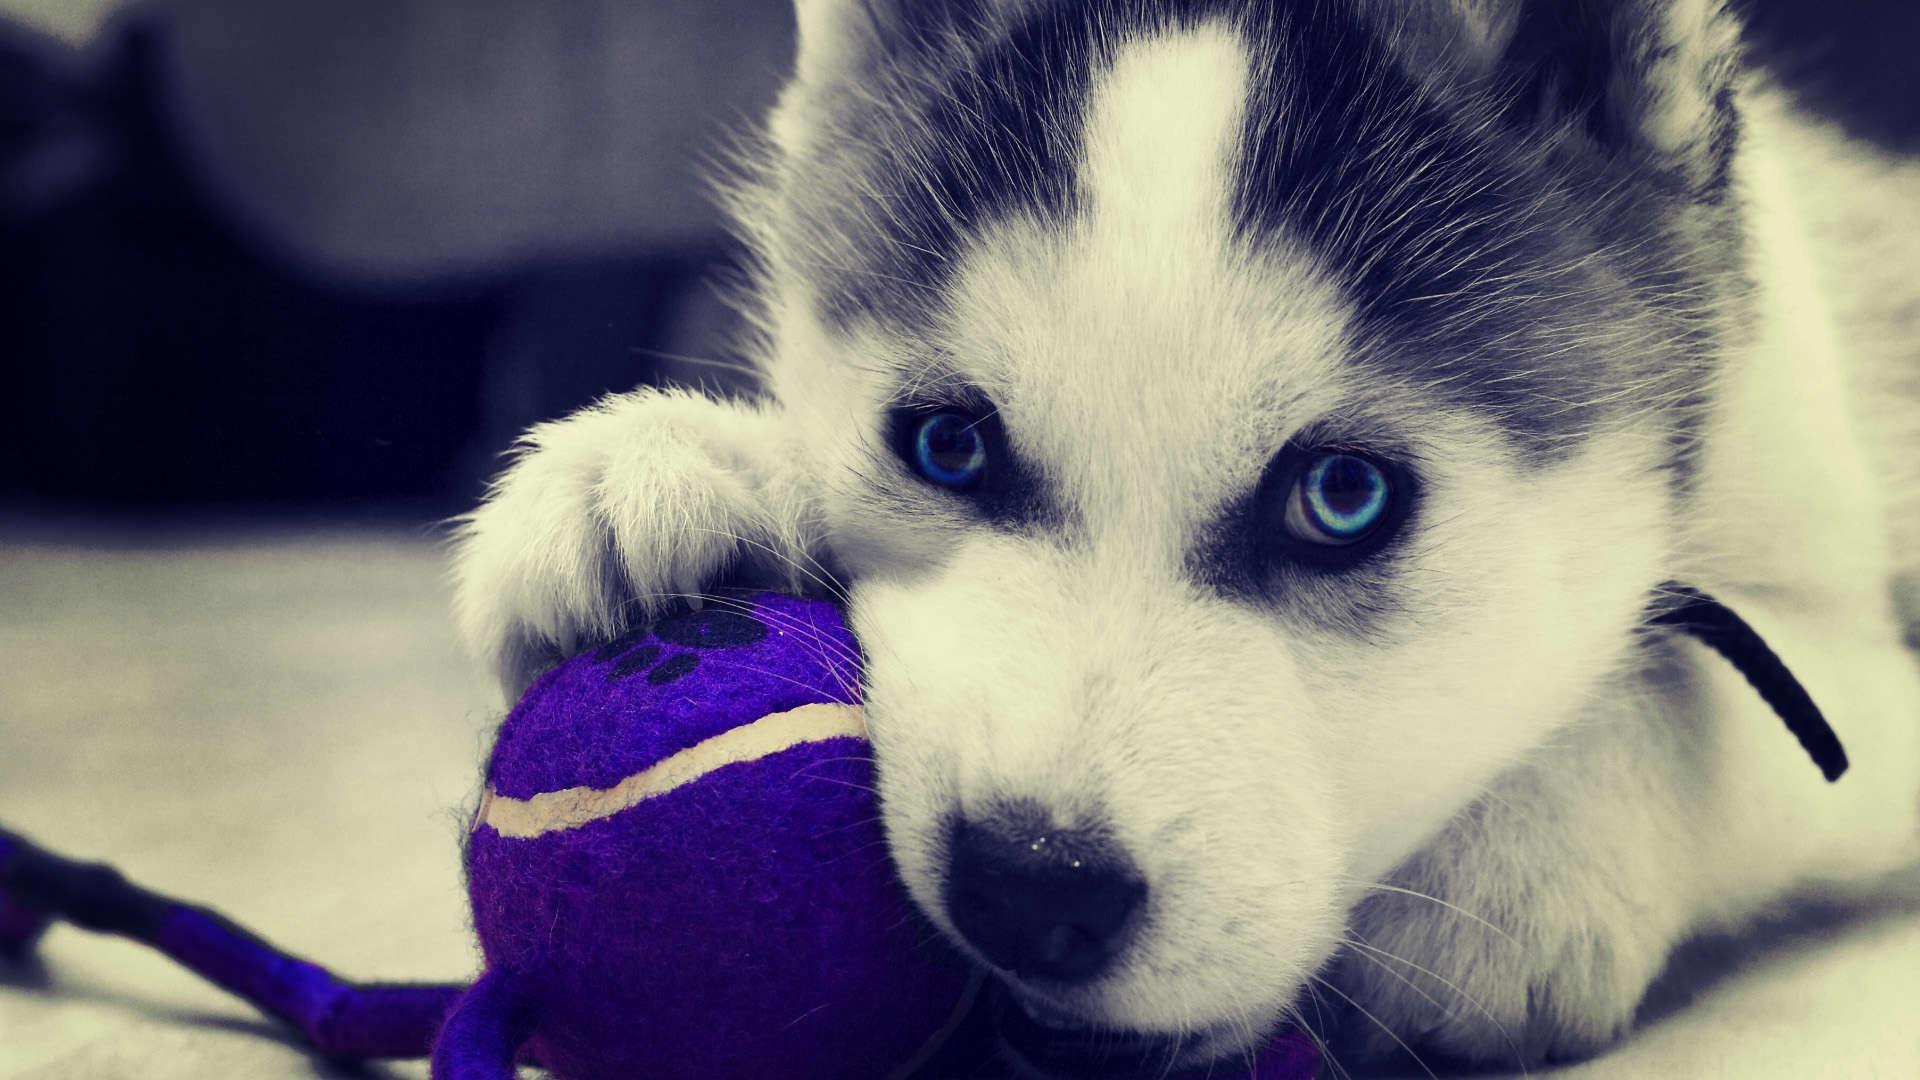 Husky Puppy Image For Desktop Wallpaper 1920 x 1080 px 623.08 KB iphone  christmas pitbull widescreen